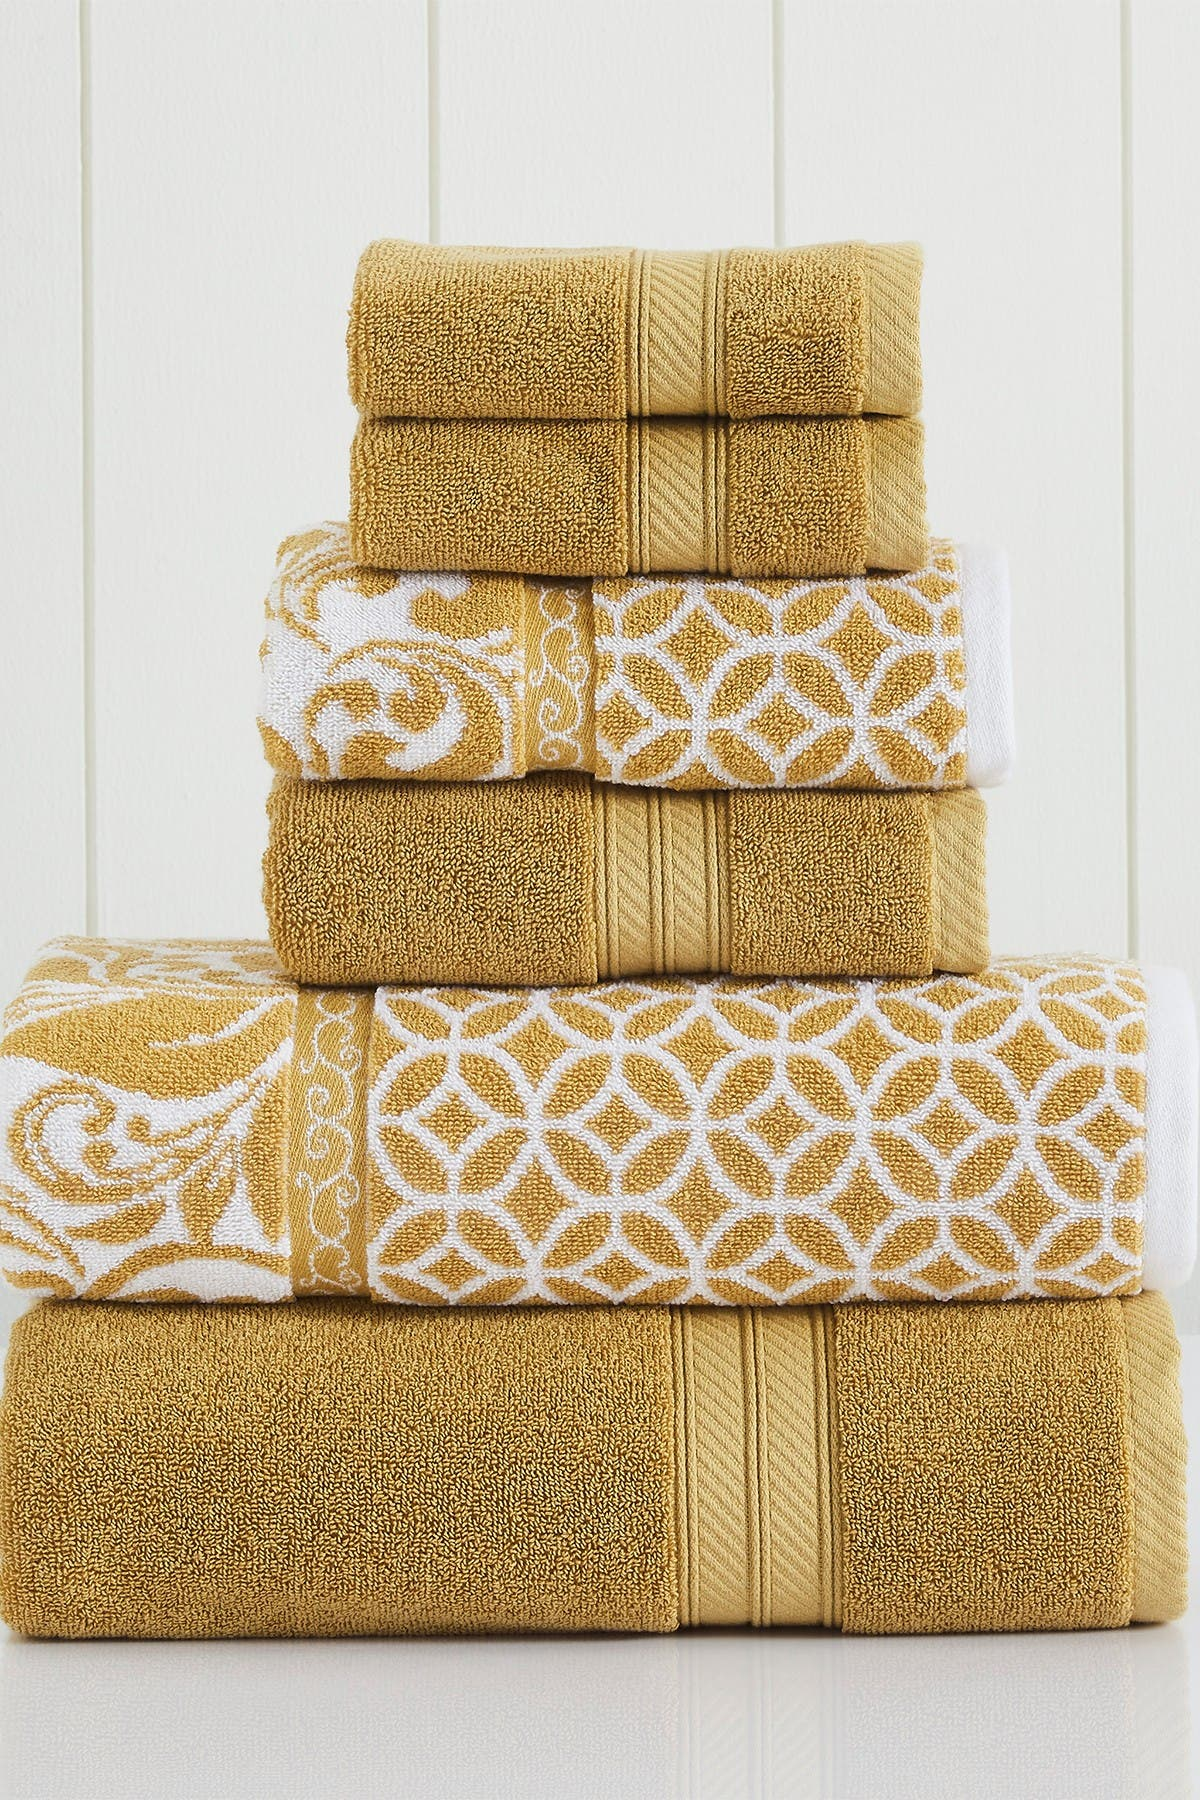 Image of Modern Threads Gold Trefoil Filigree Reversible Yarn-Dyed Jacquard 6-Piece Towel Set